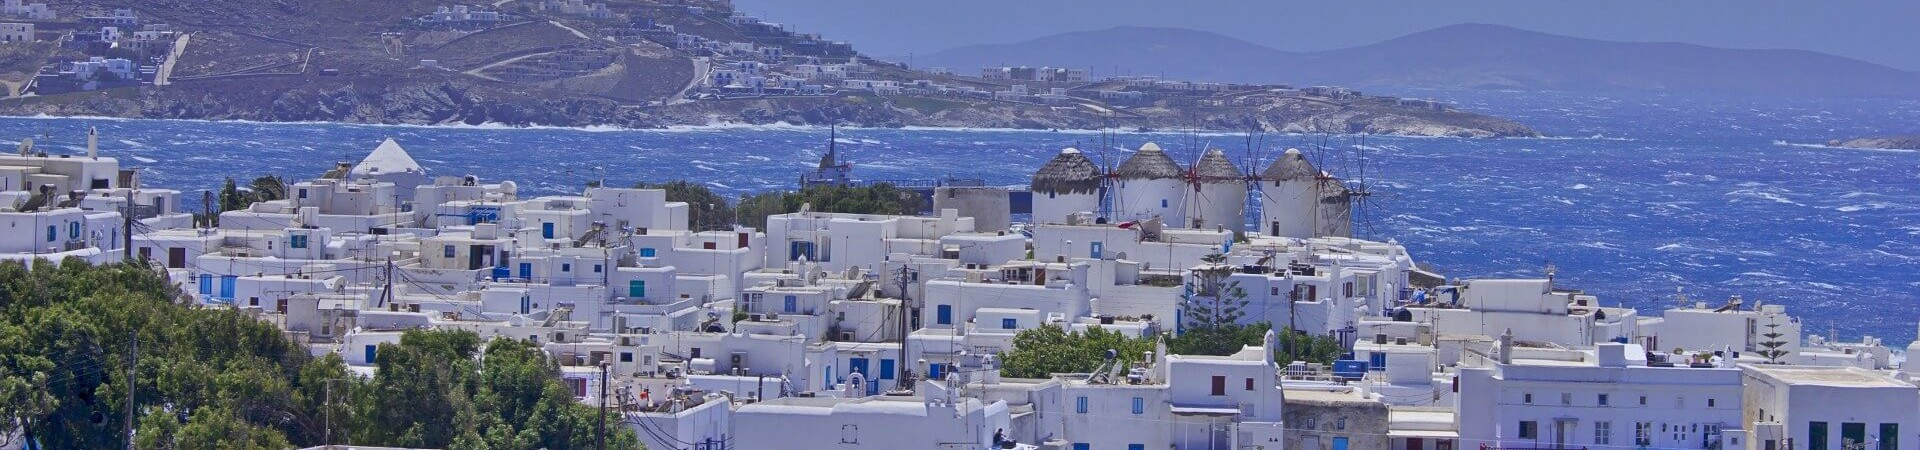 Grecja Mykonos